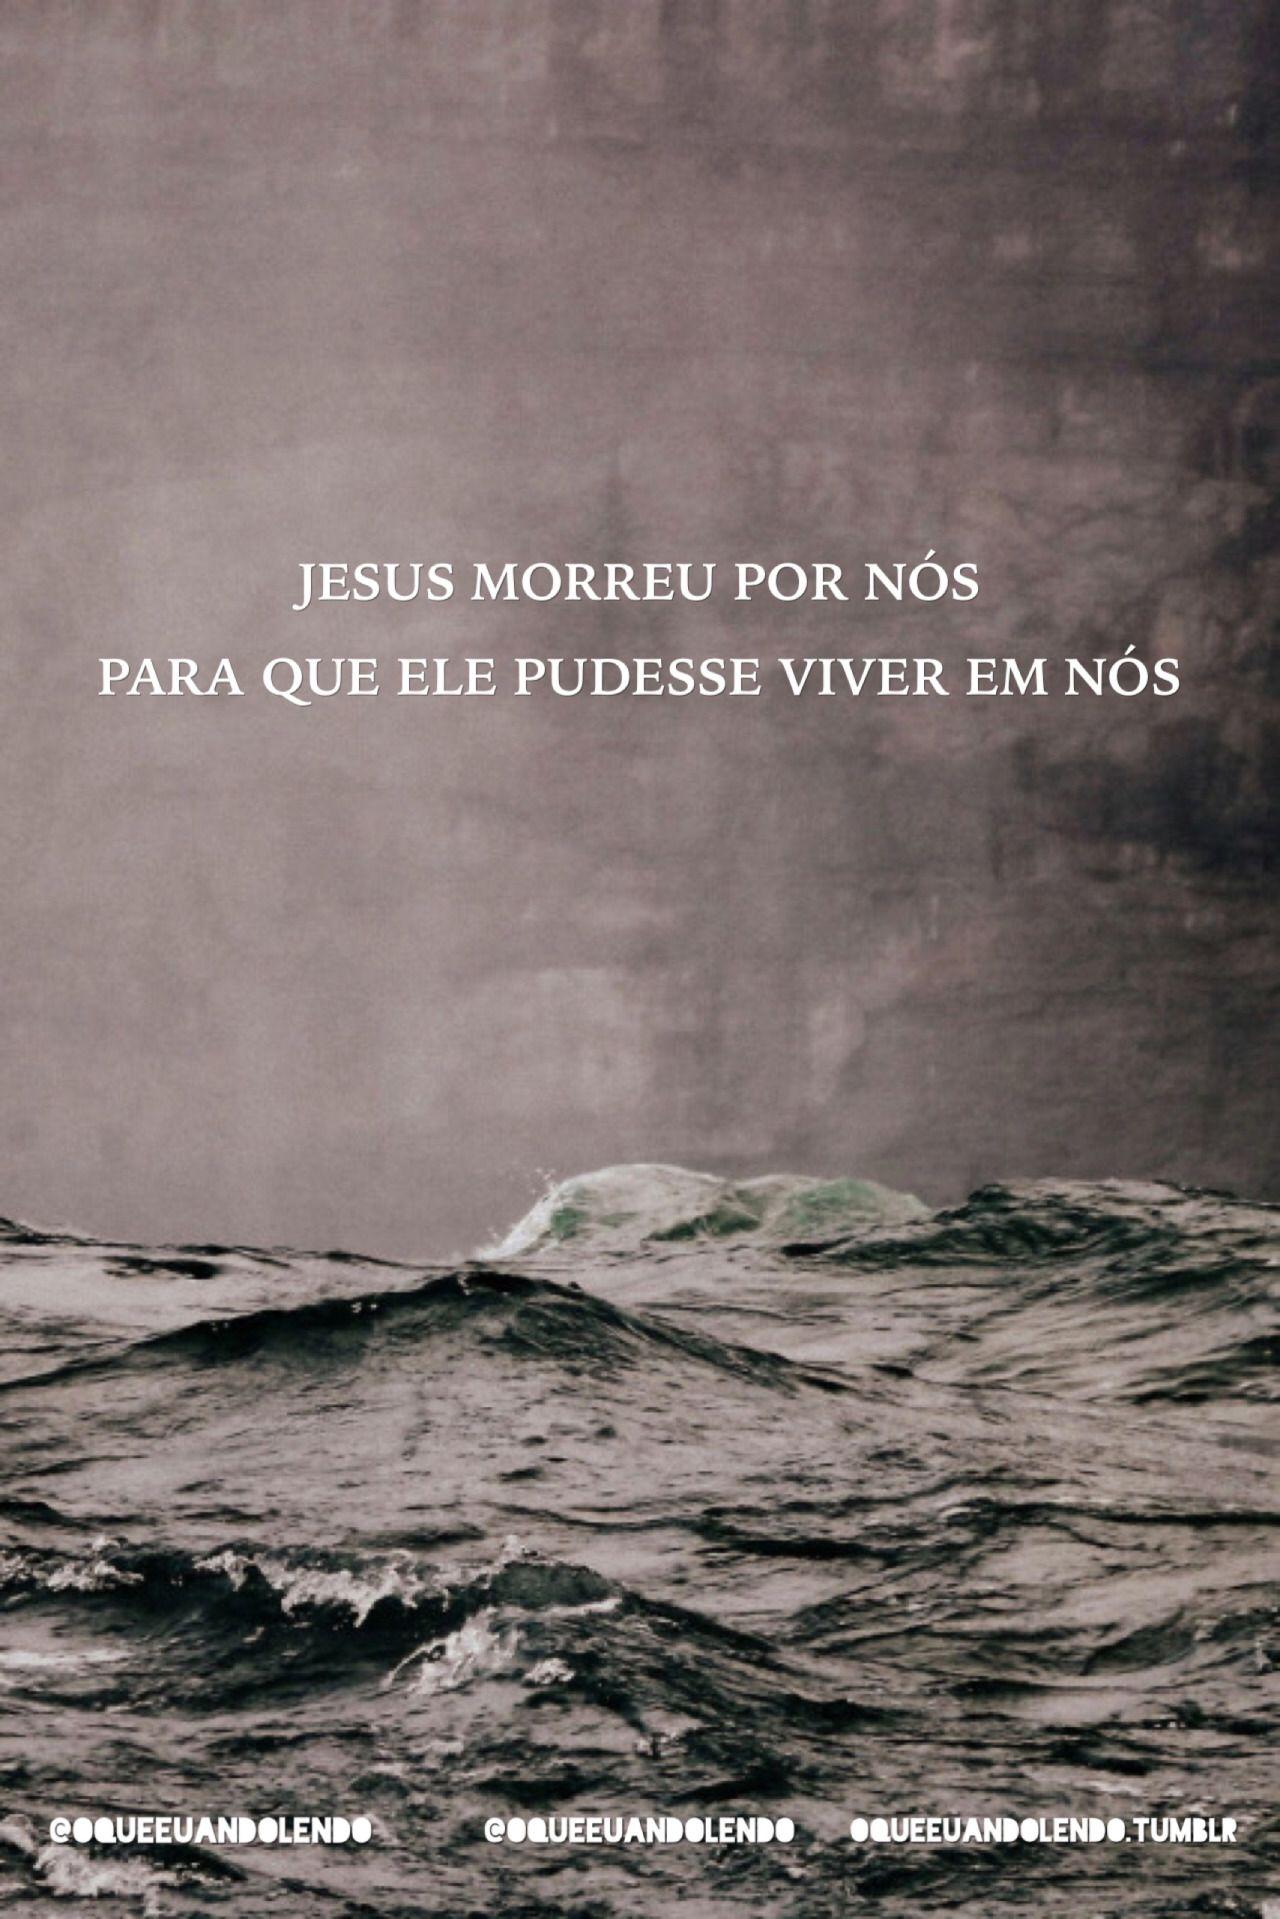 oqueeuandolendo tumblr frases jesuscristo mensagem amor